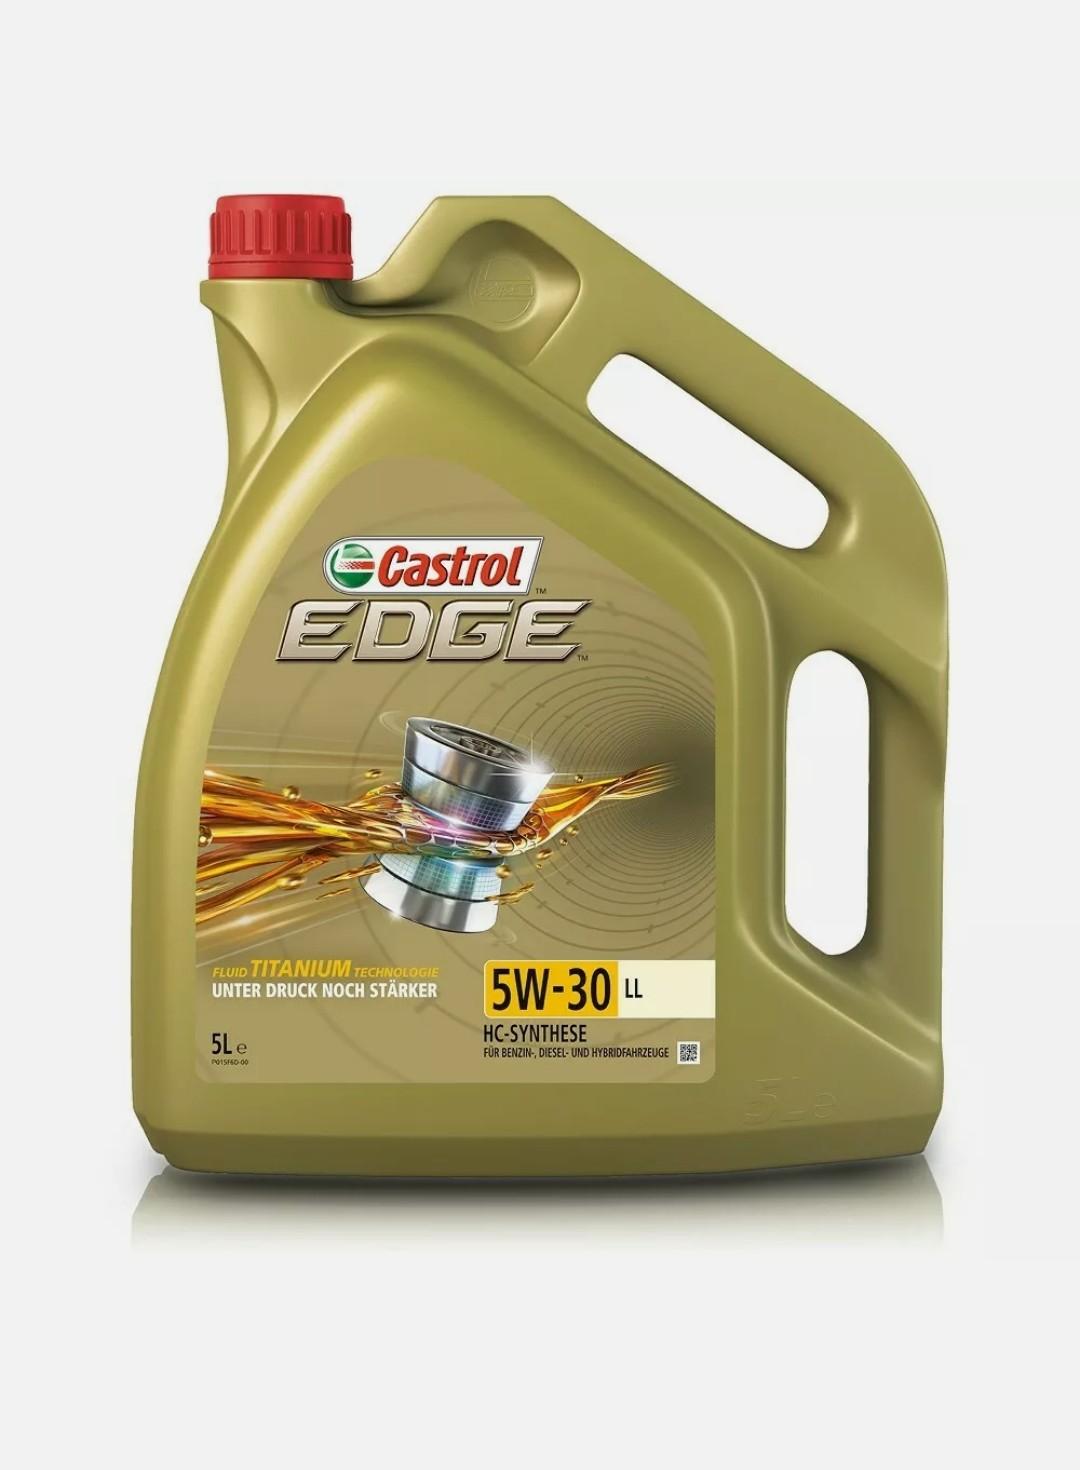 Castrol Edge Fluid Titanium - 5 Liter 5W-30 LL Motoröl